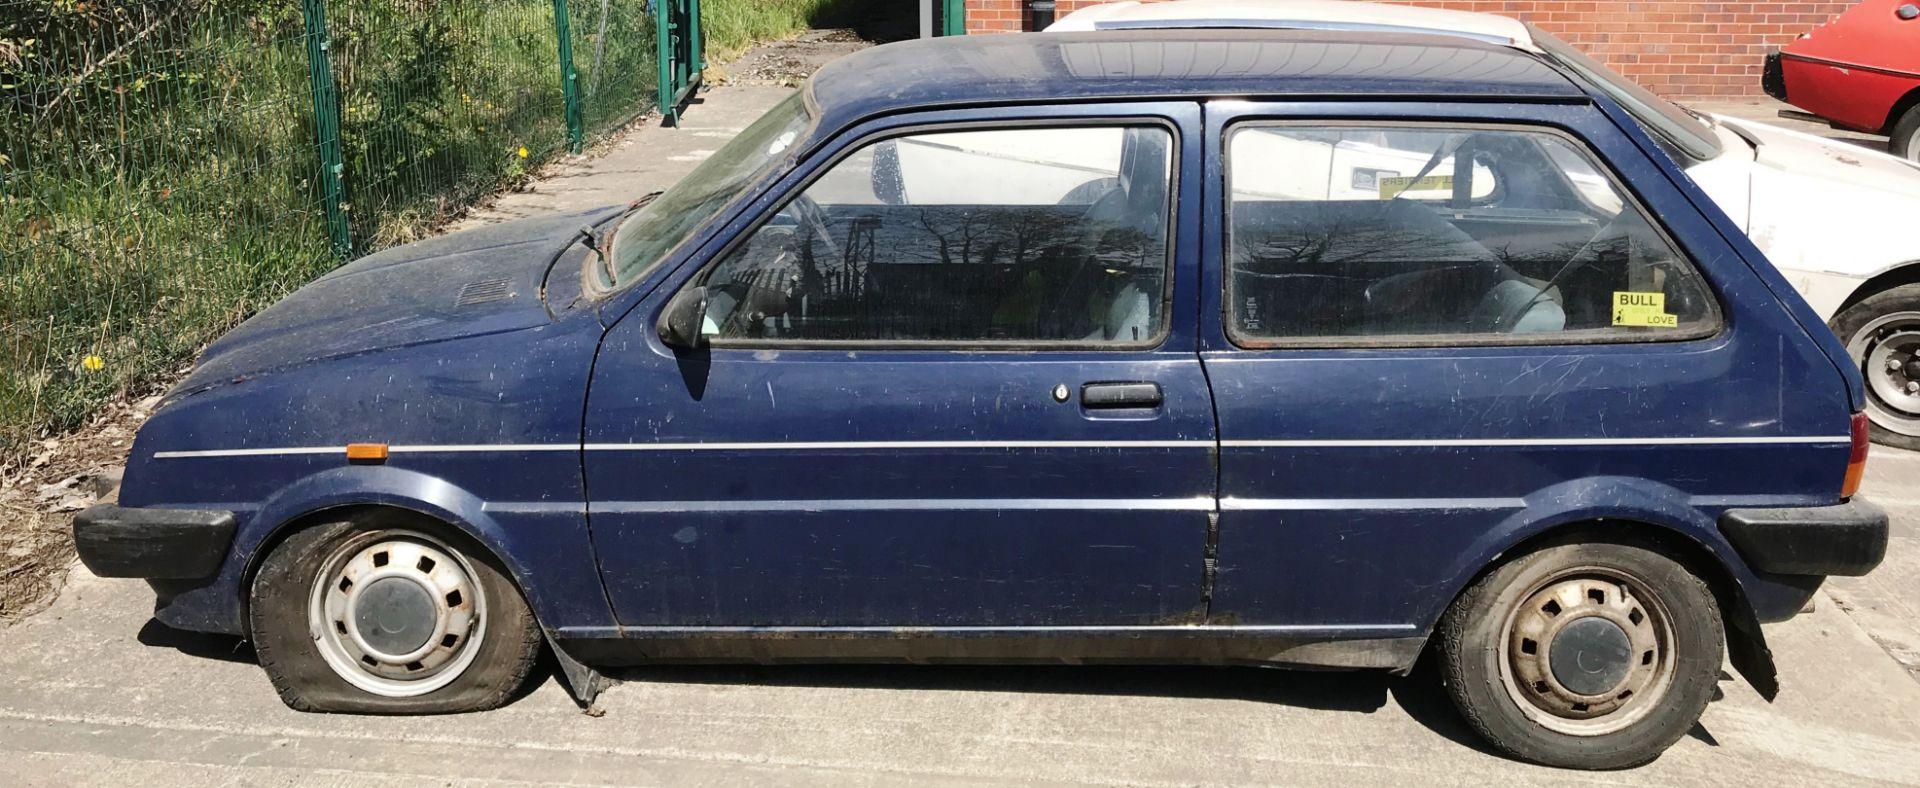 GARAGE FIND - IN NEED OF FULL RESTORATION AUSTIN METRO 1300L 3 DOOR HATCHBACK - petrol - blue - Image 2 of 11